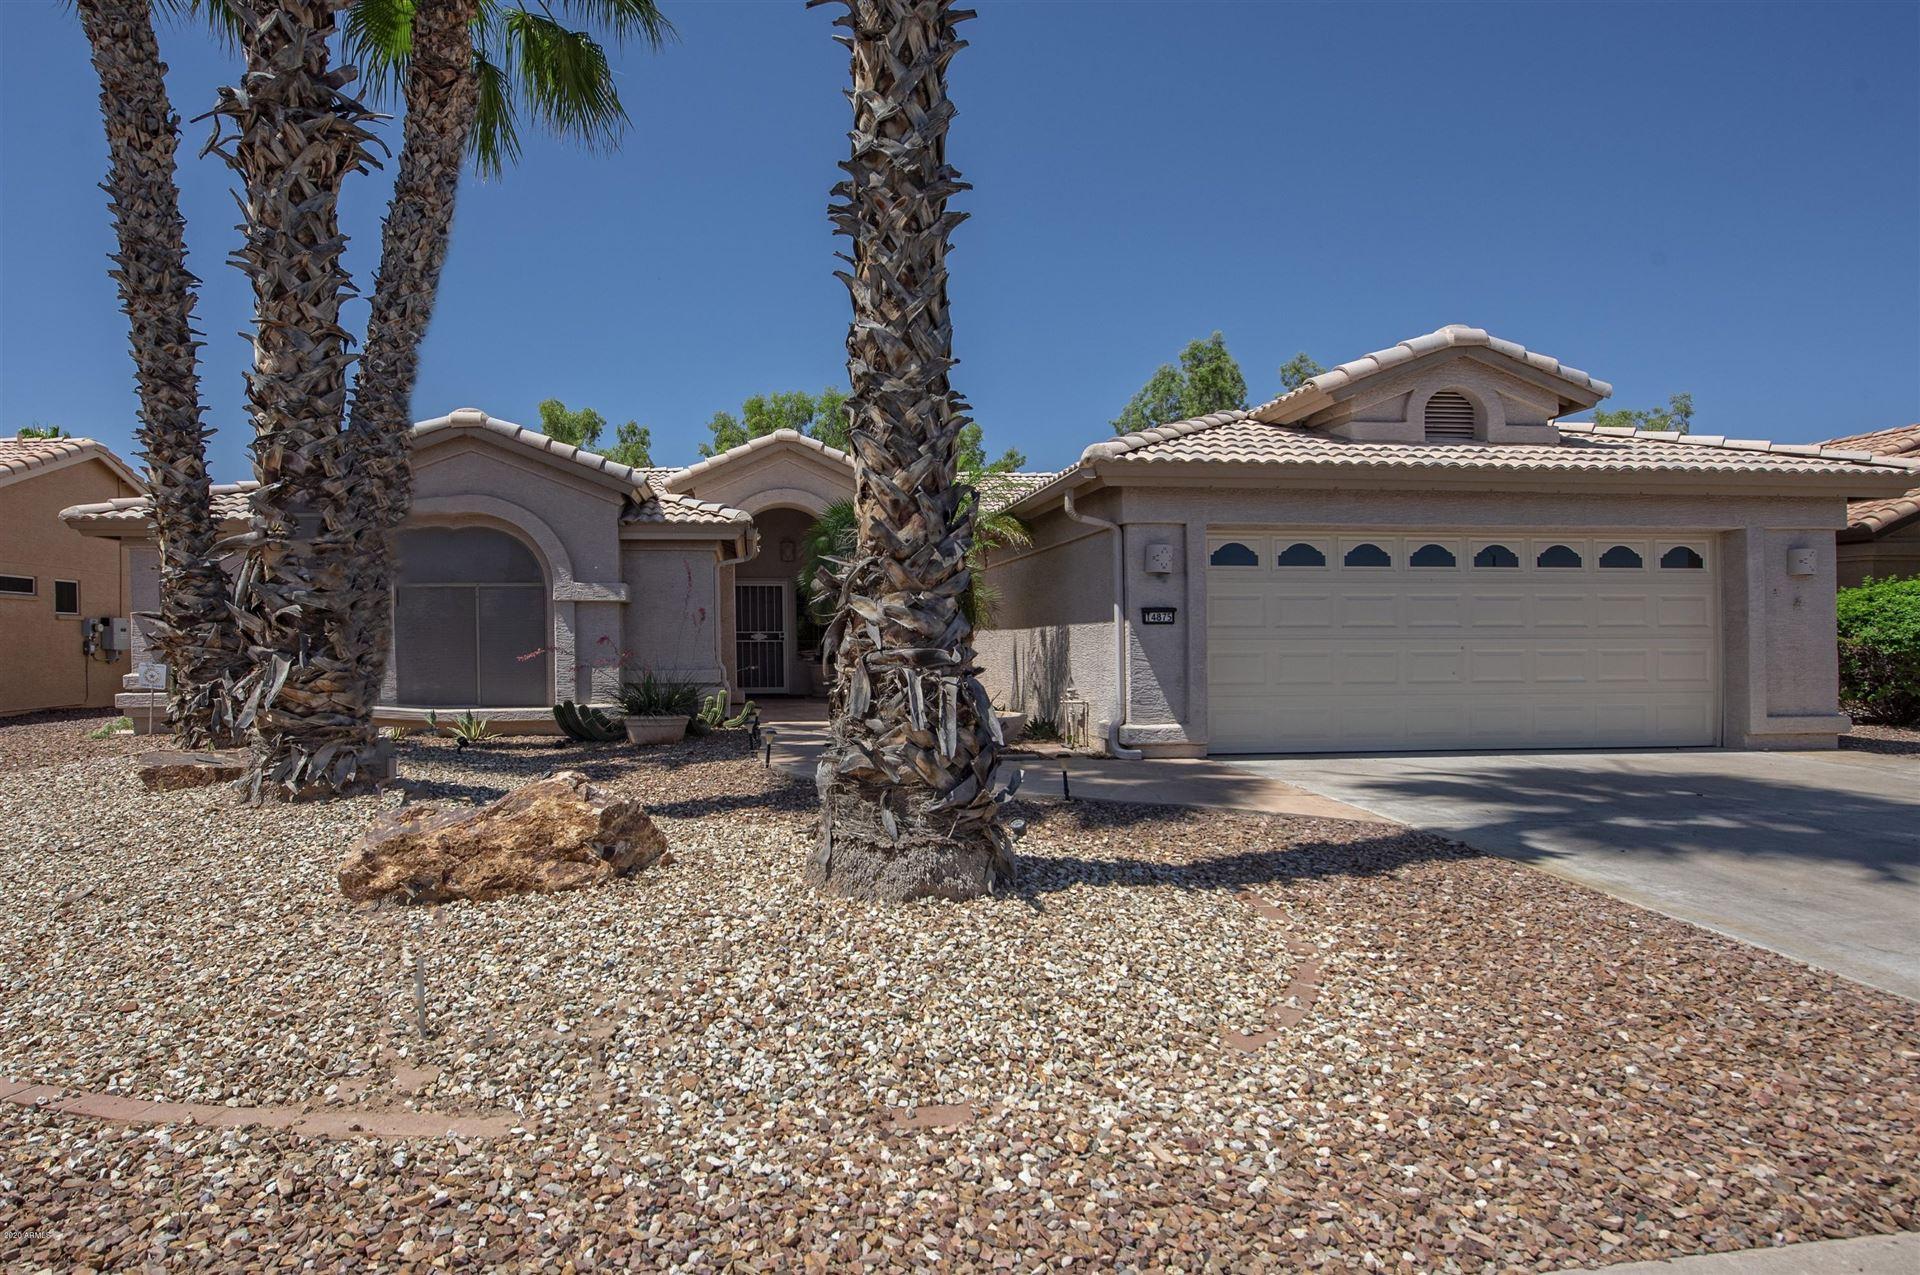 14875 W PICCADILLY Road, Goodyear, AZ 85395 - MLS#: 6080927